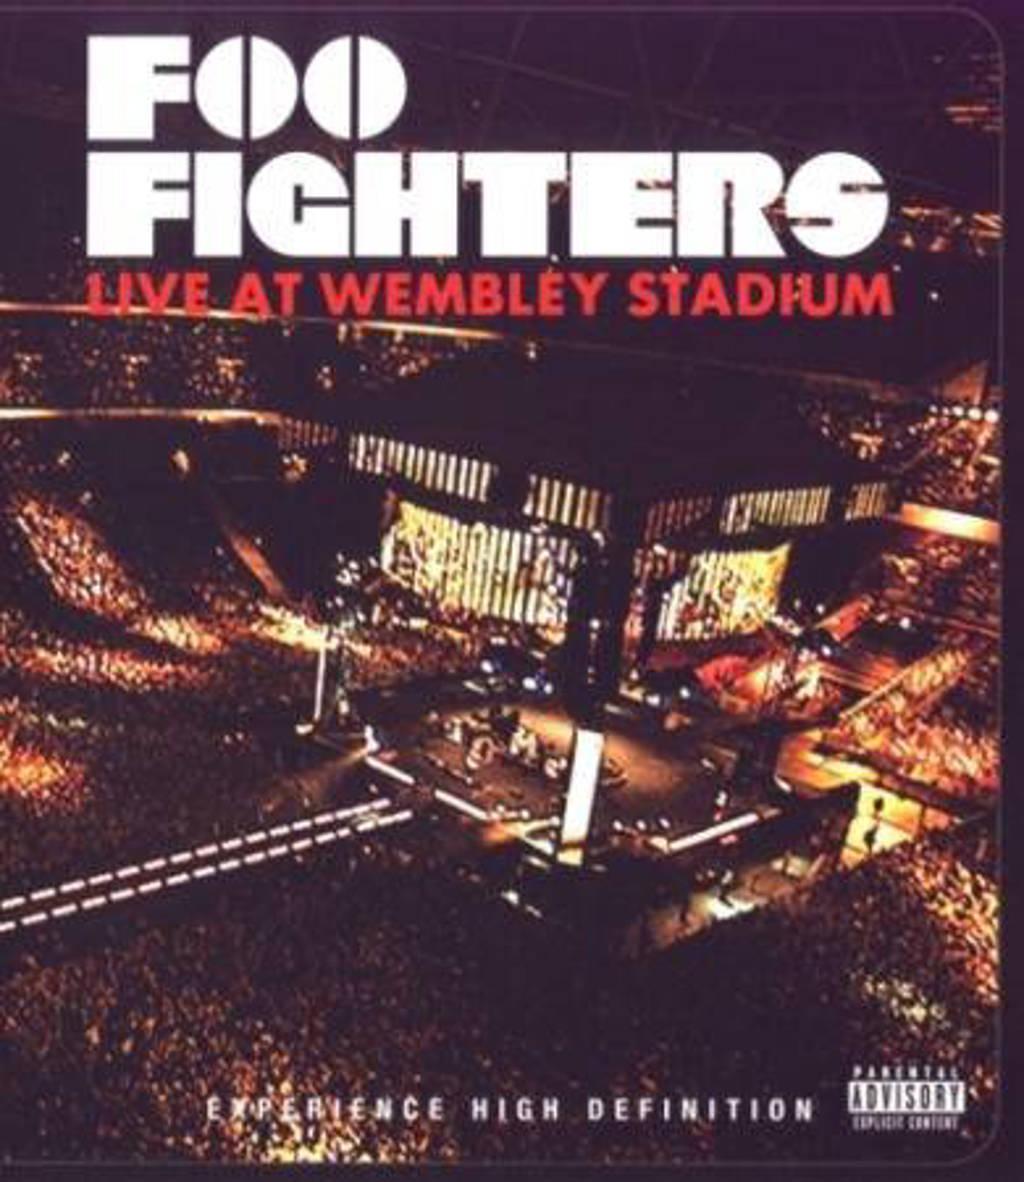 Foo fighters - live at Wembley Stadium (Blu-ray)